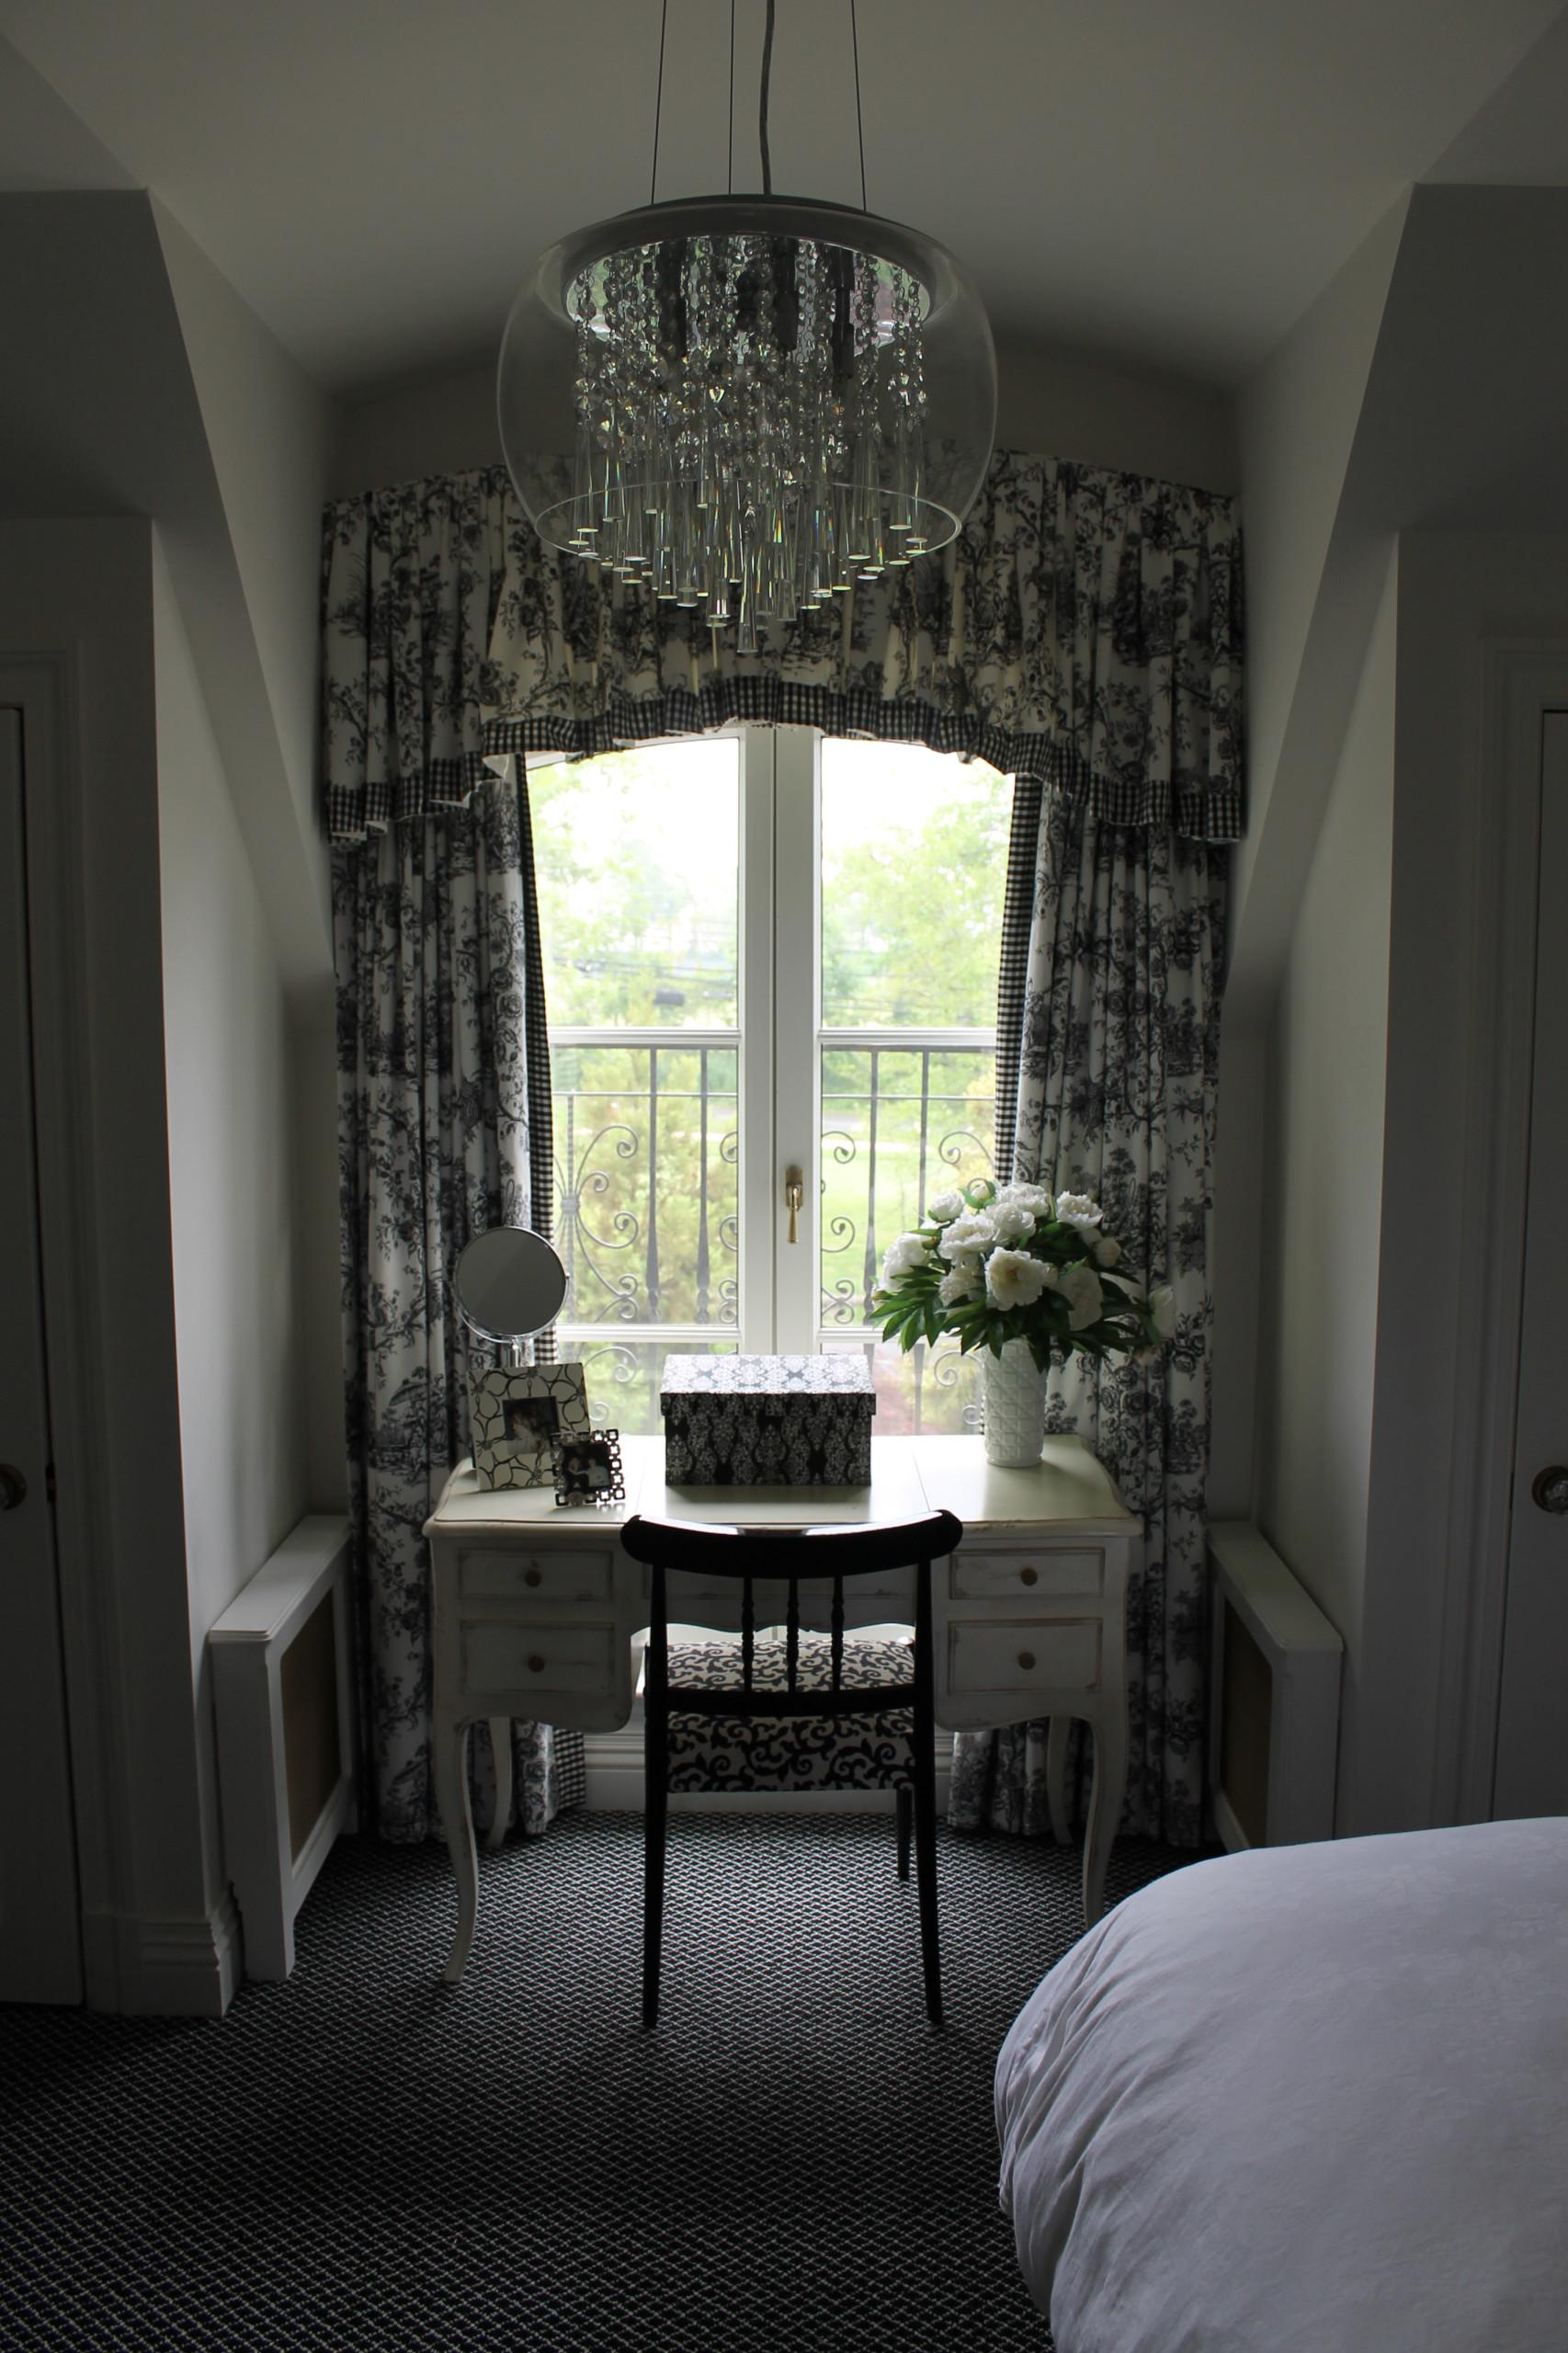 Black & White Bedroom Lawrence, NY Home